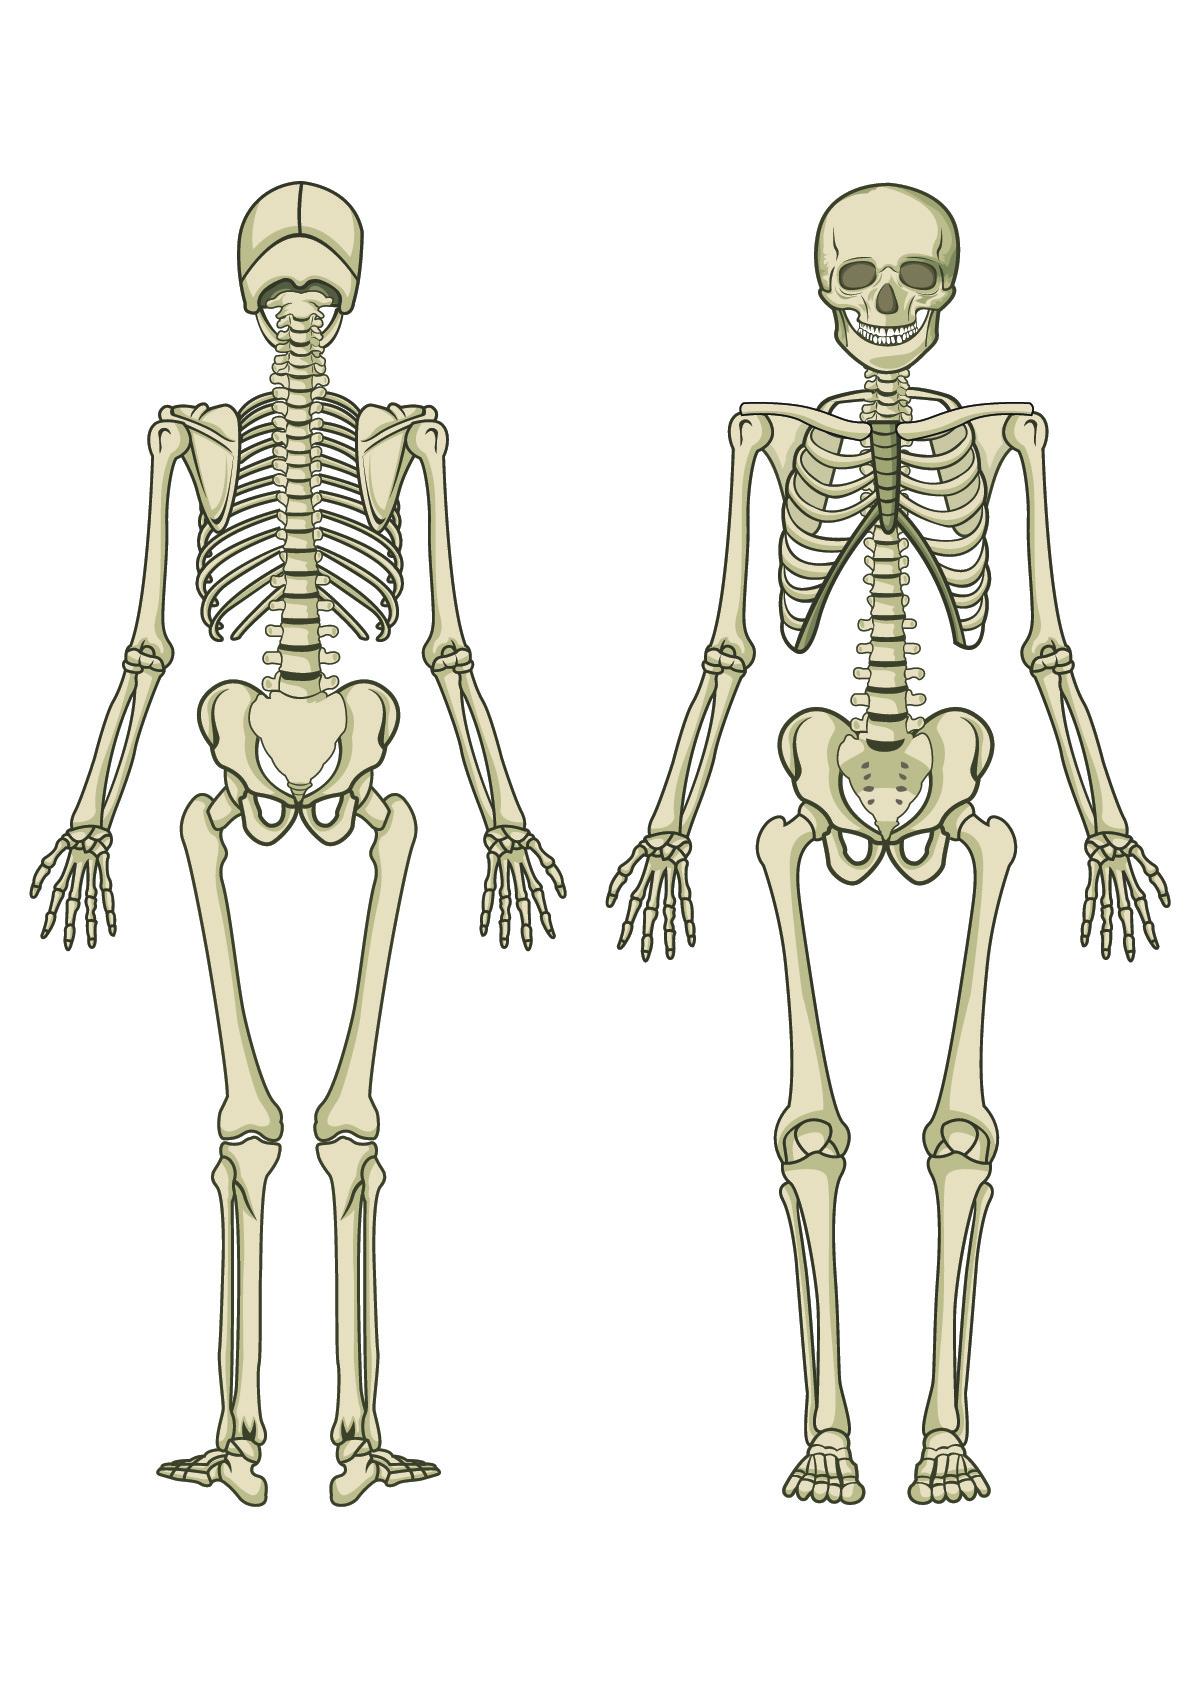 Human Skeleton Joint Diagram Unlabeled Wiring Diagram For Light